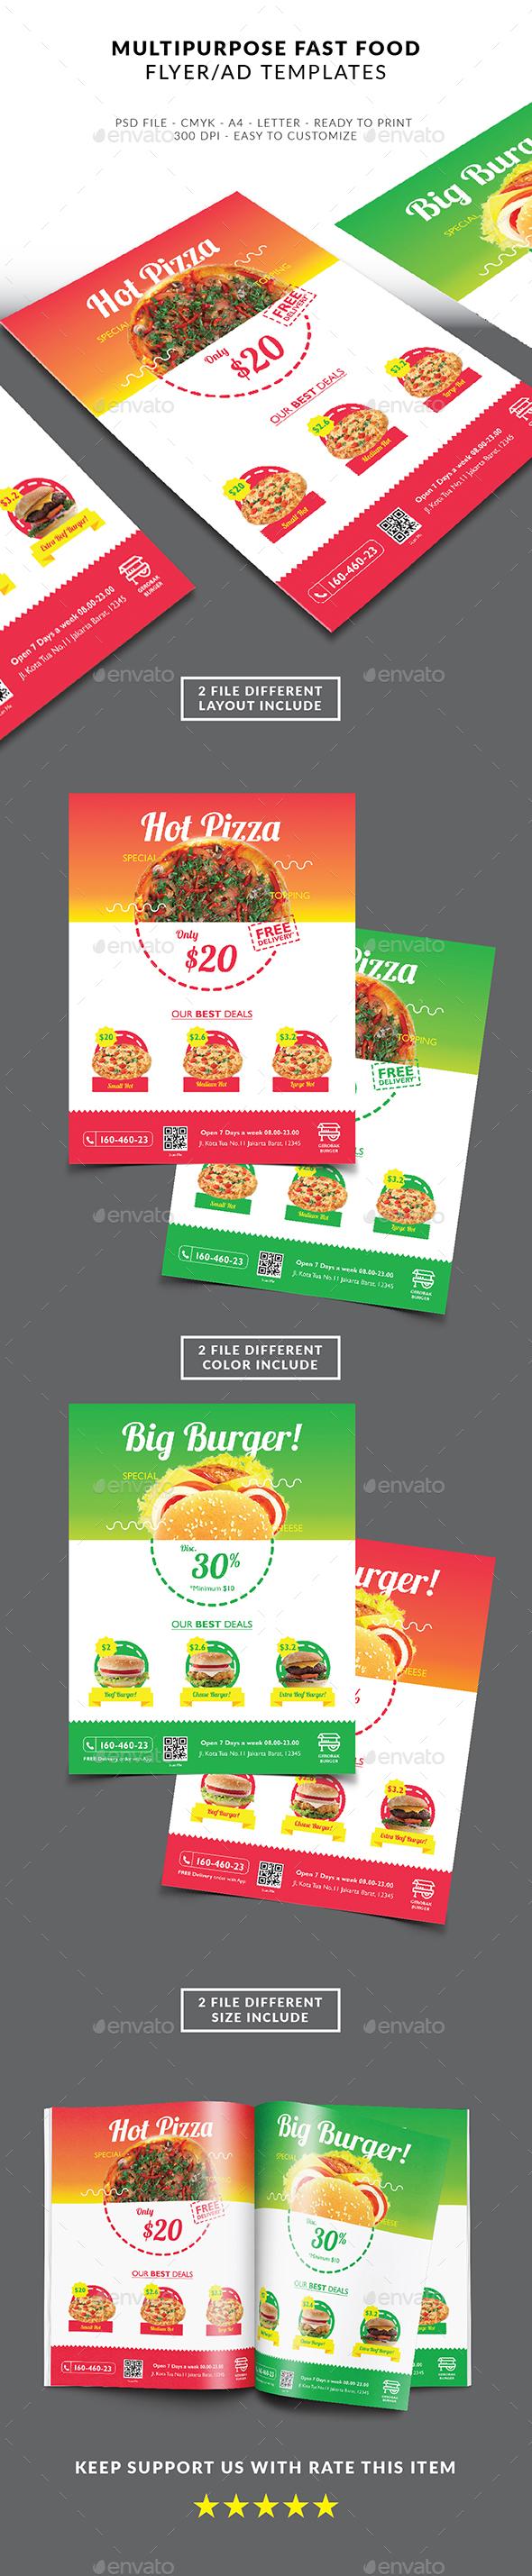 Multipurpose Fast Food Flyer - Restaurant Flyers